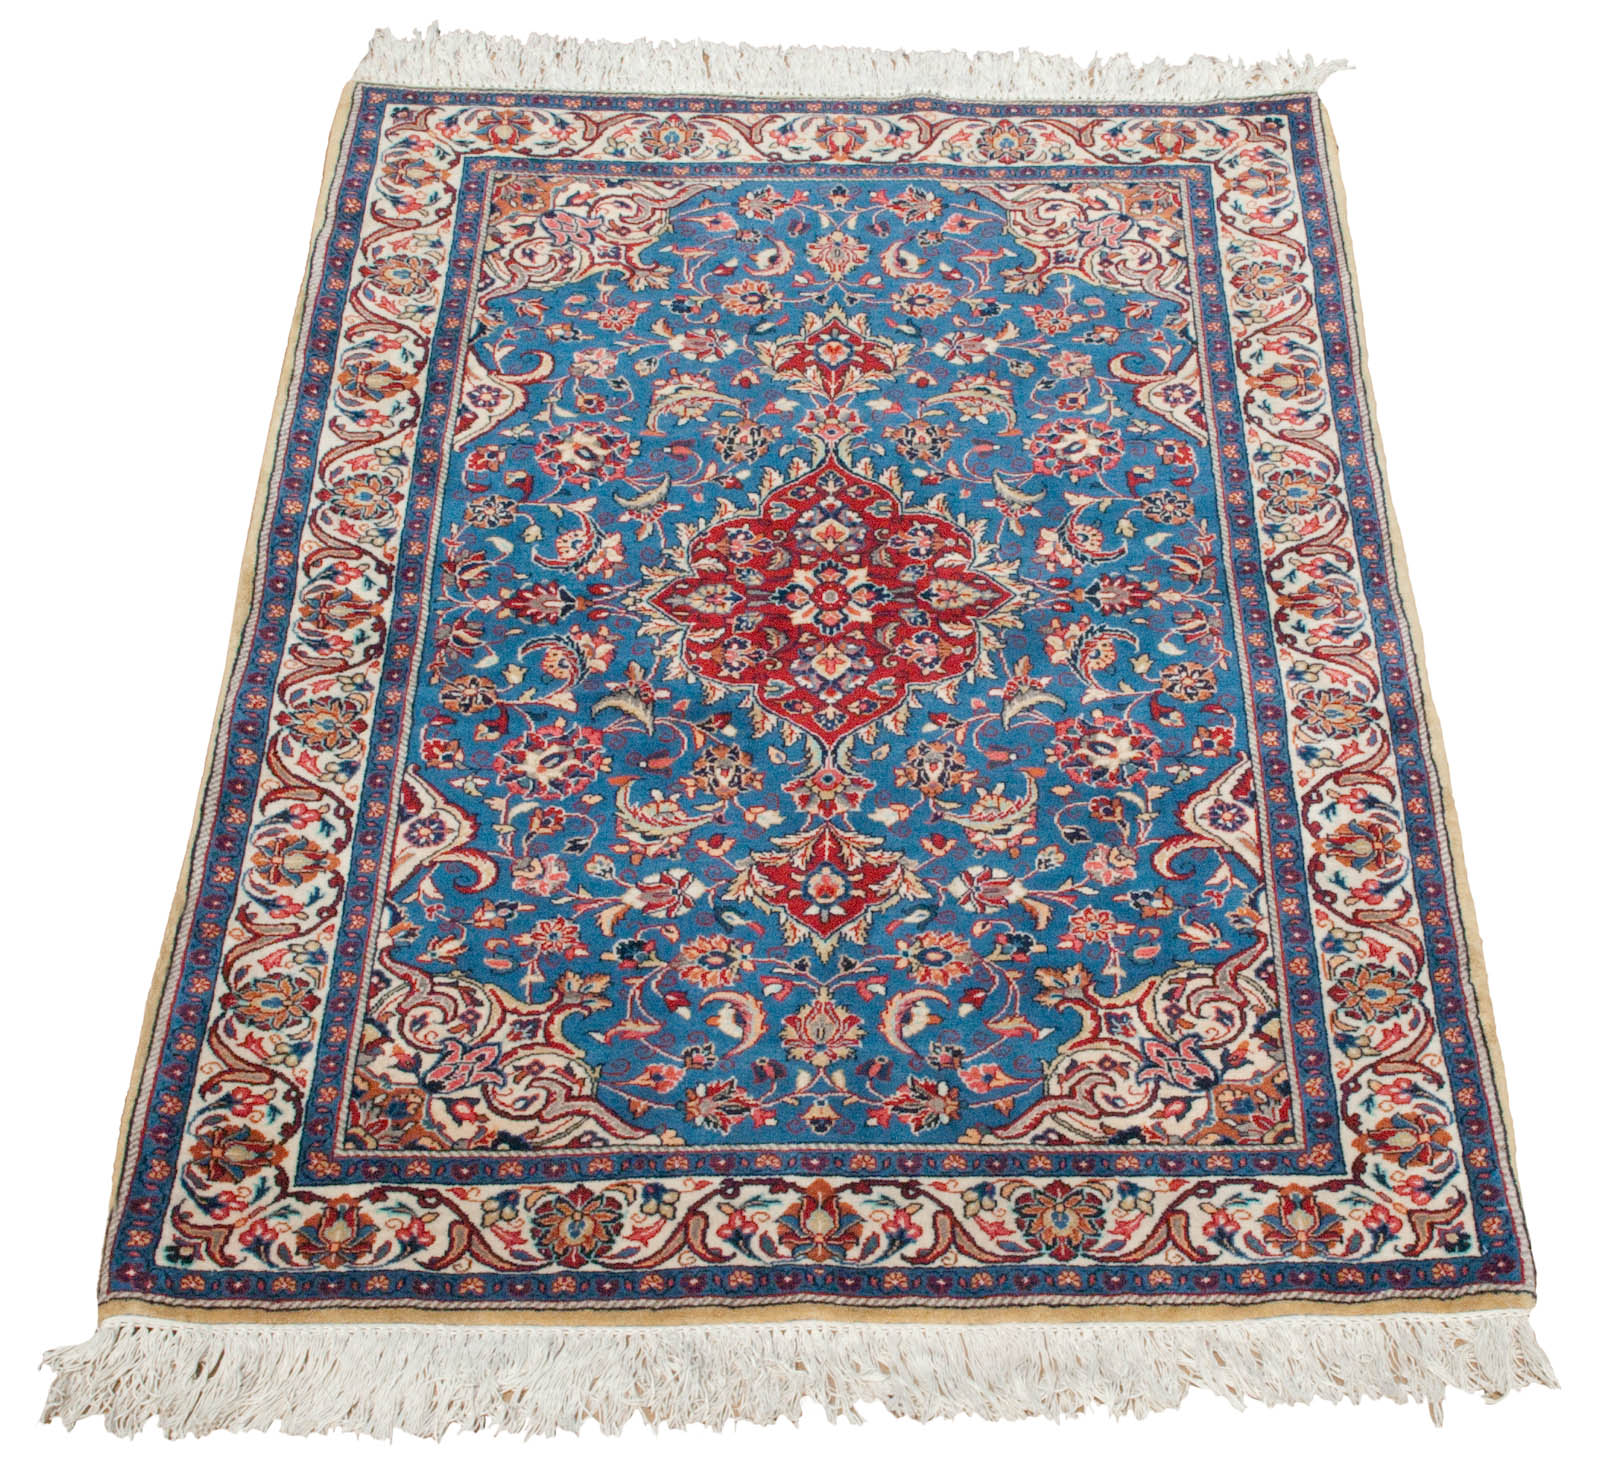 Unique Rich BLUE Persian Sarouk Rug